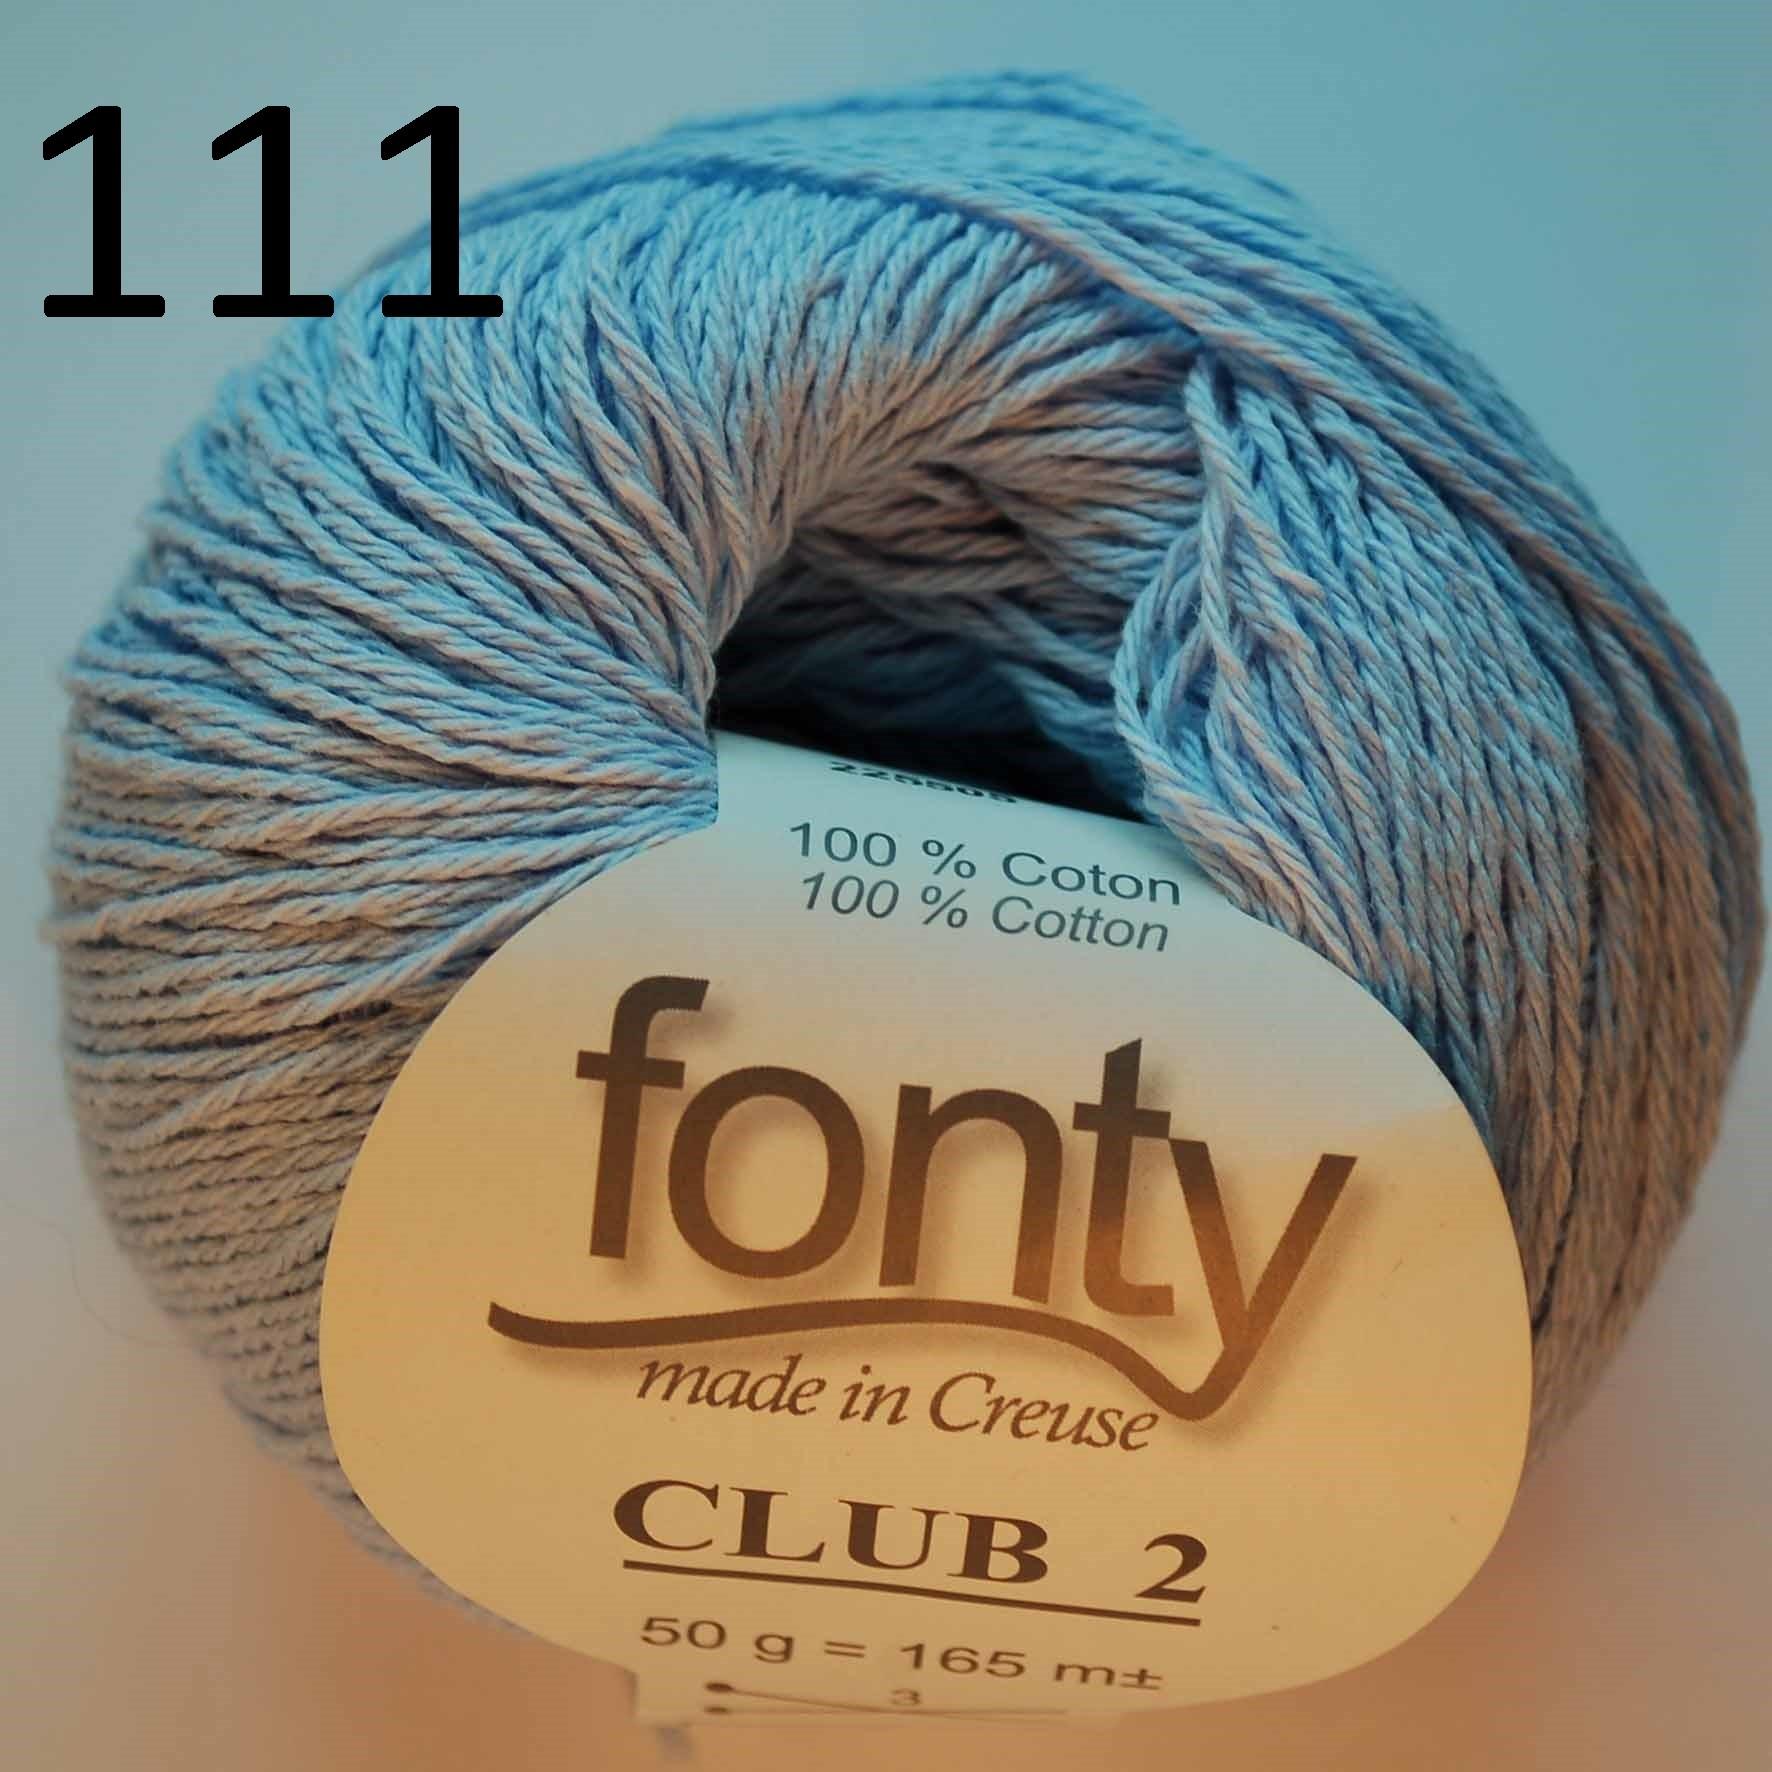 Club 2 111